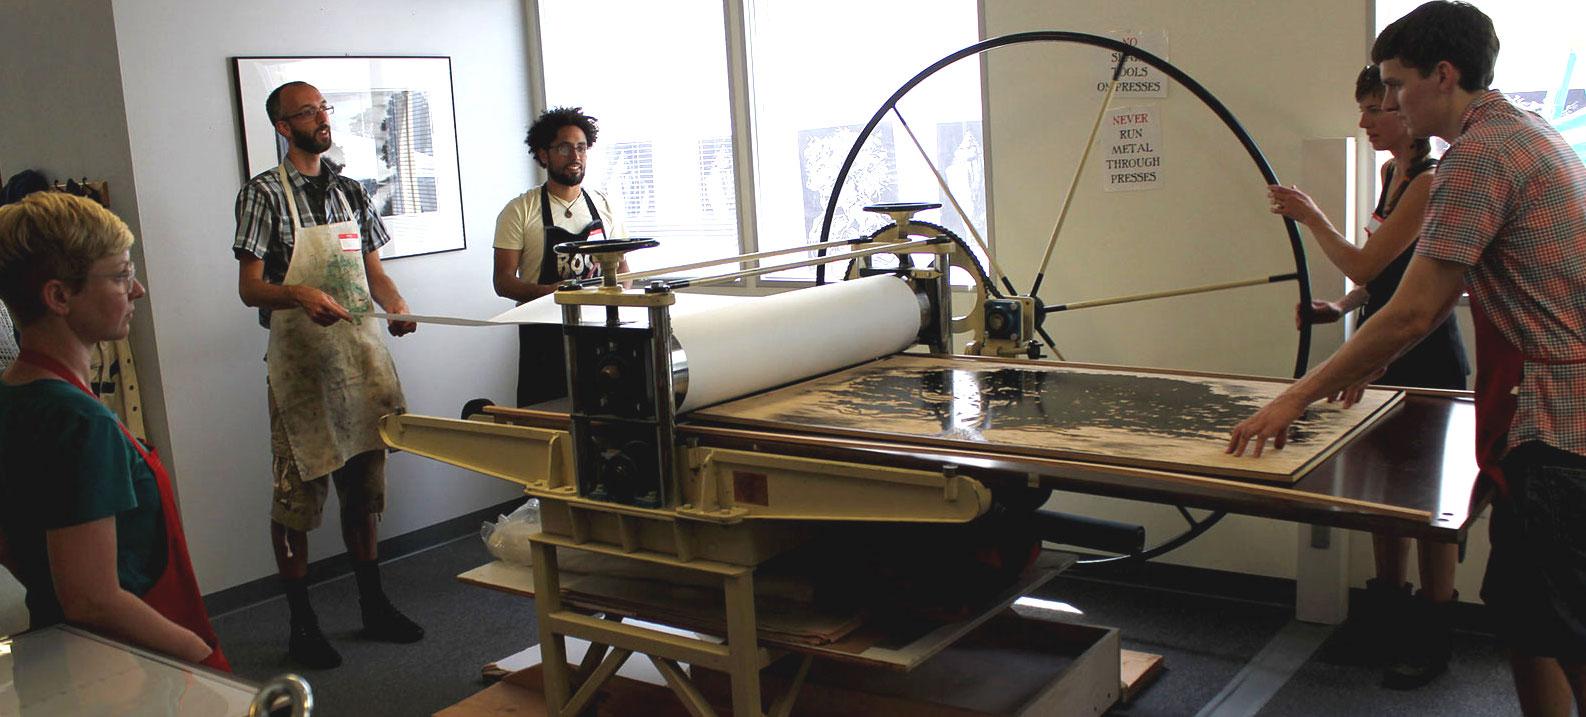 big-ink-whiteaker-printmakers-eugene-or-6 cropped.jpeg